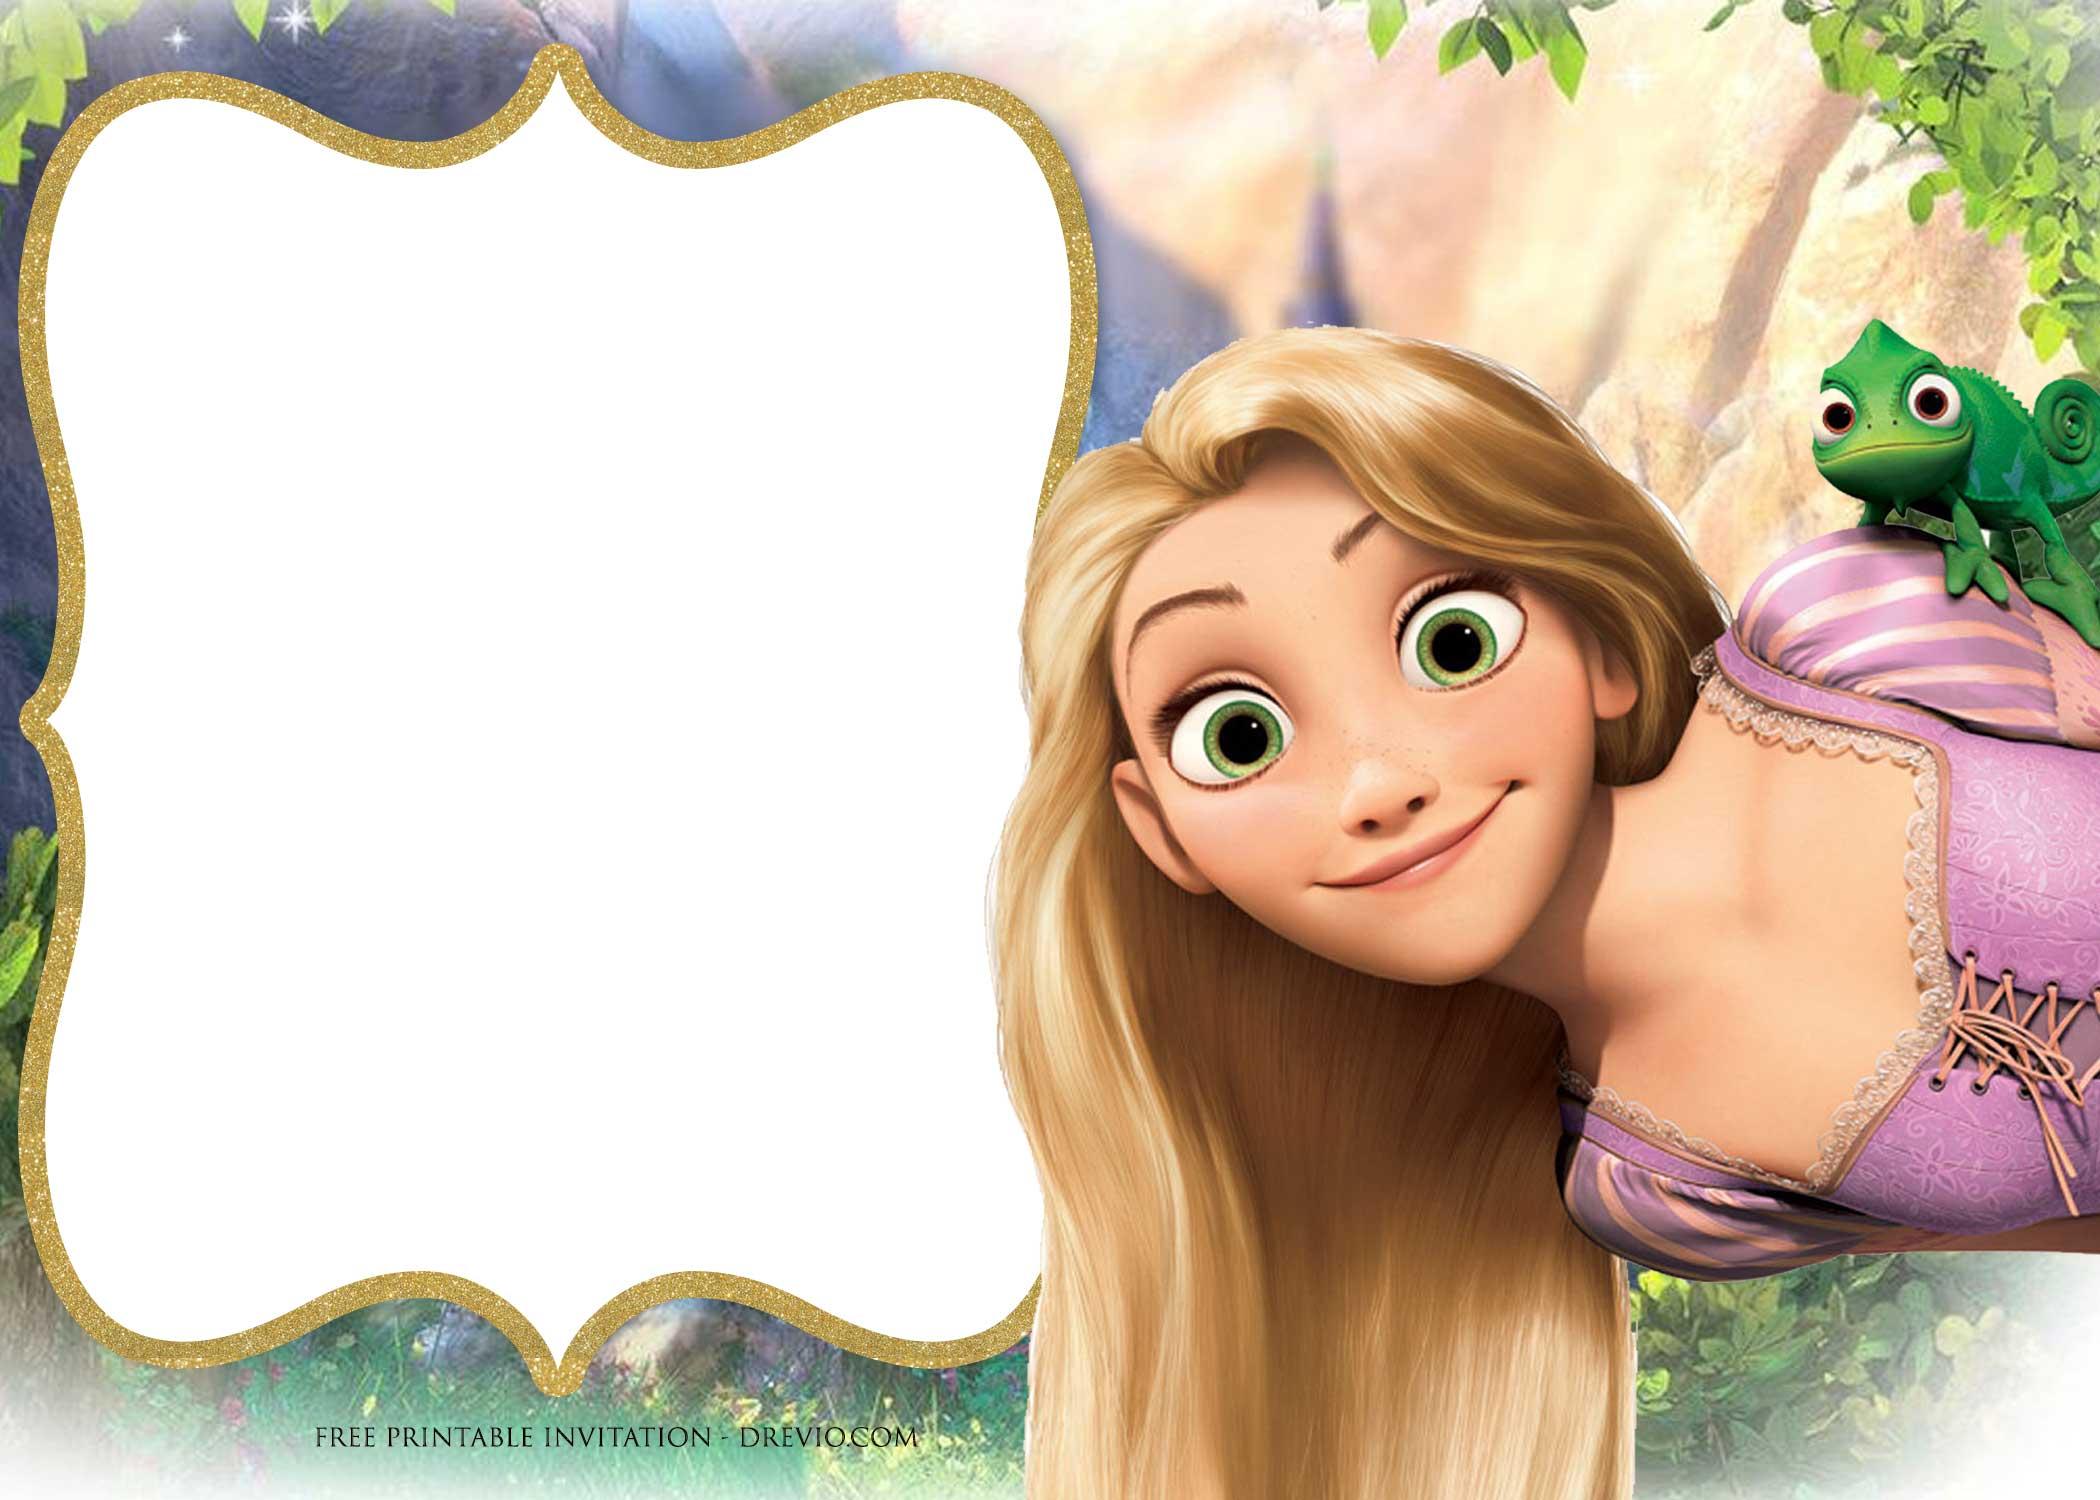 Free Printable Princess Rapunzel Invitation Templates Free Invitation Templates